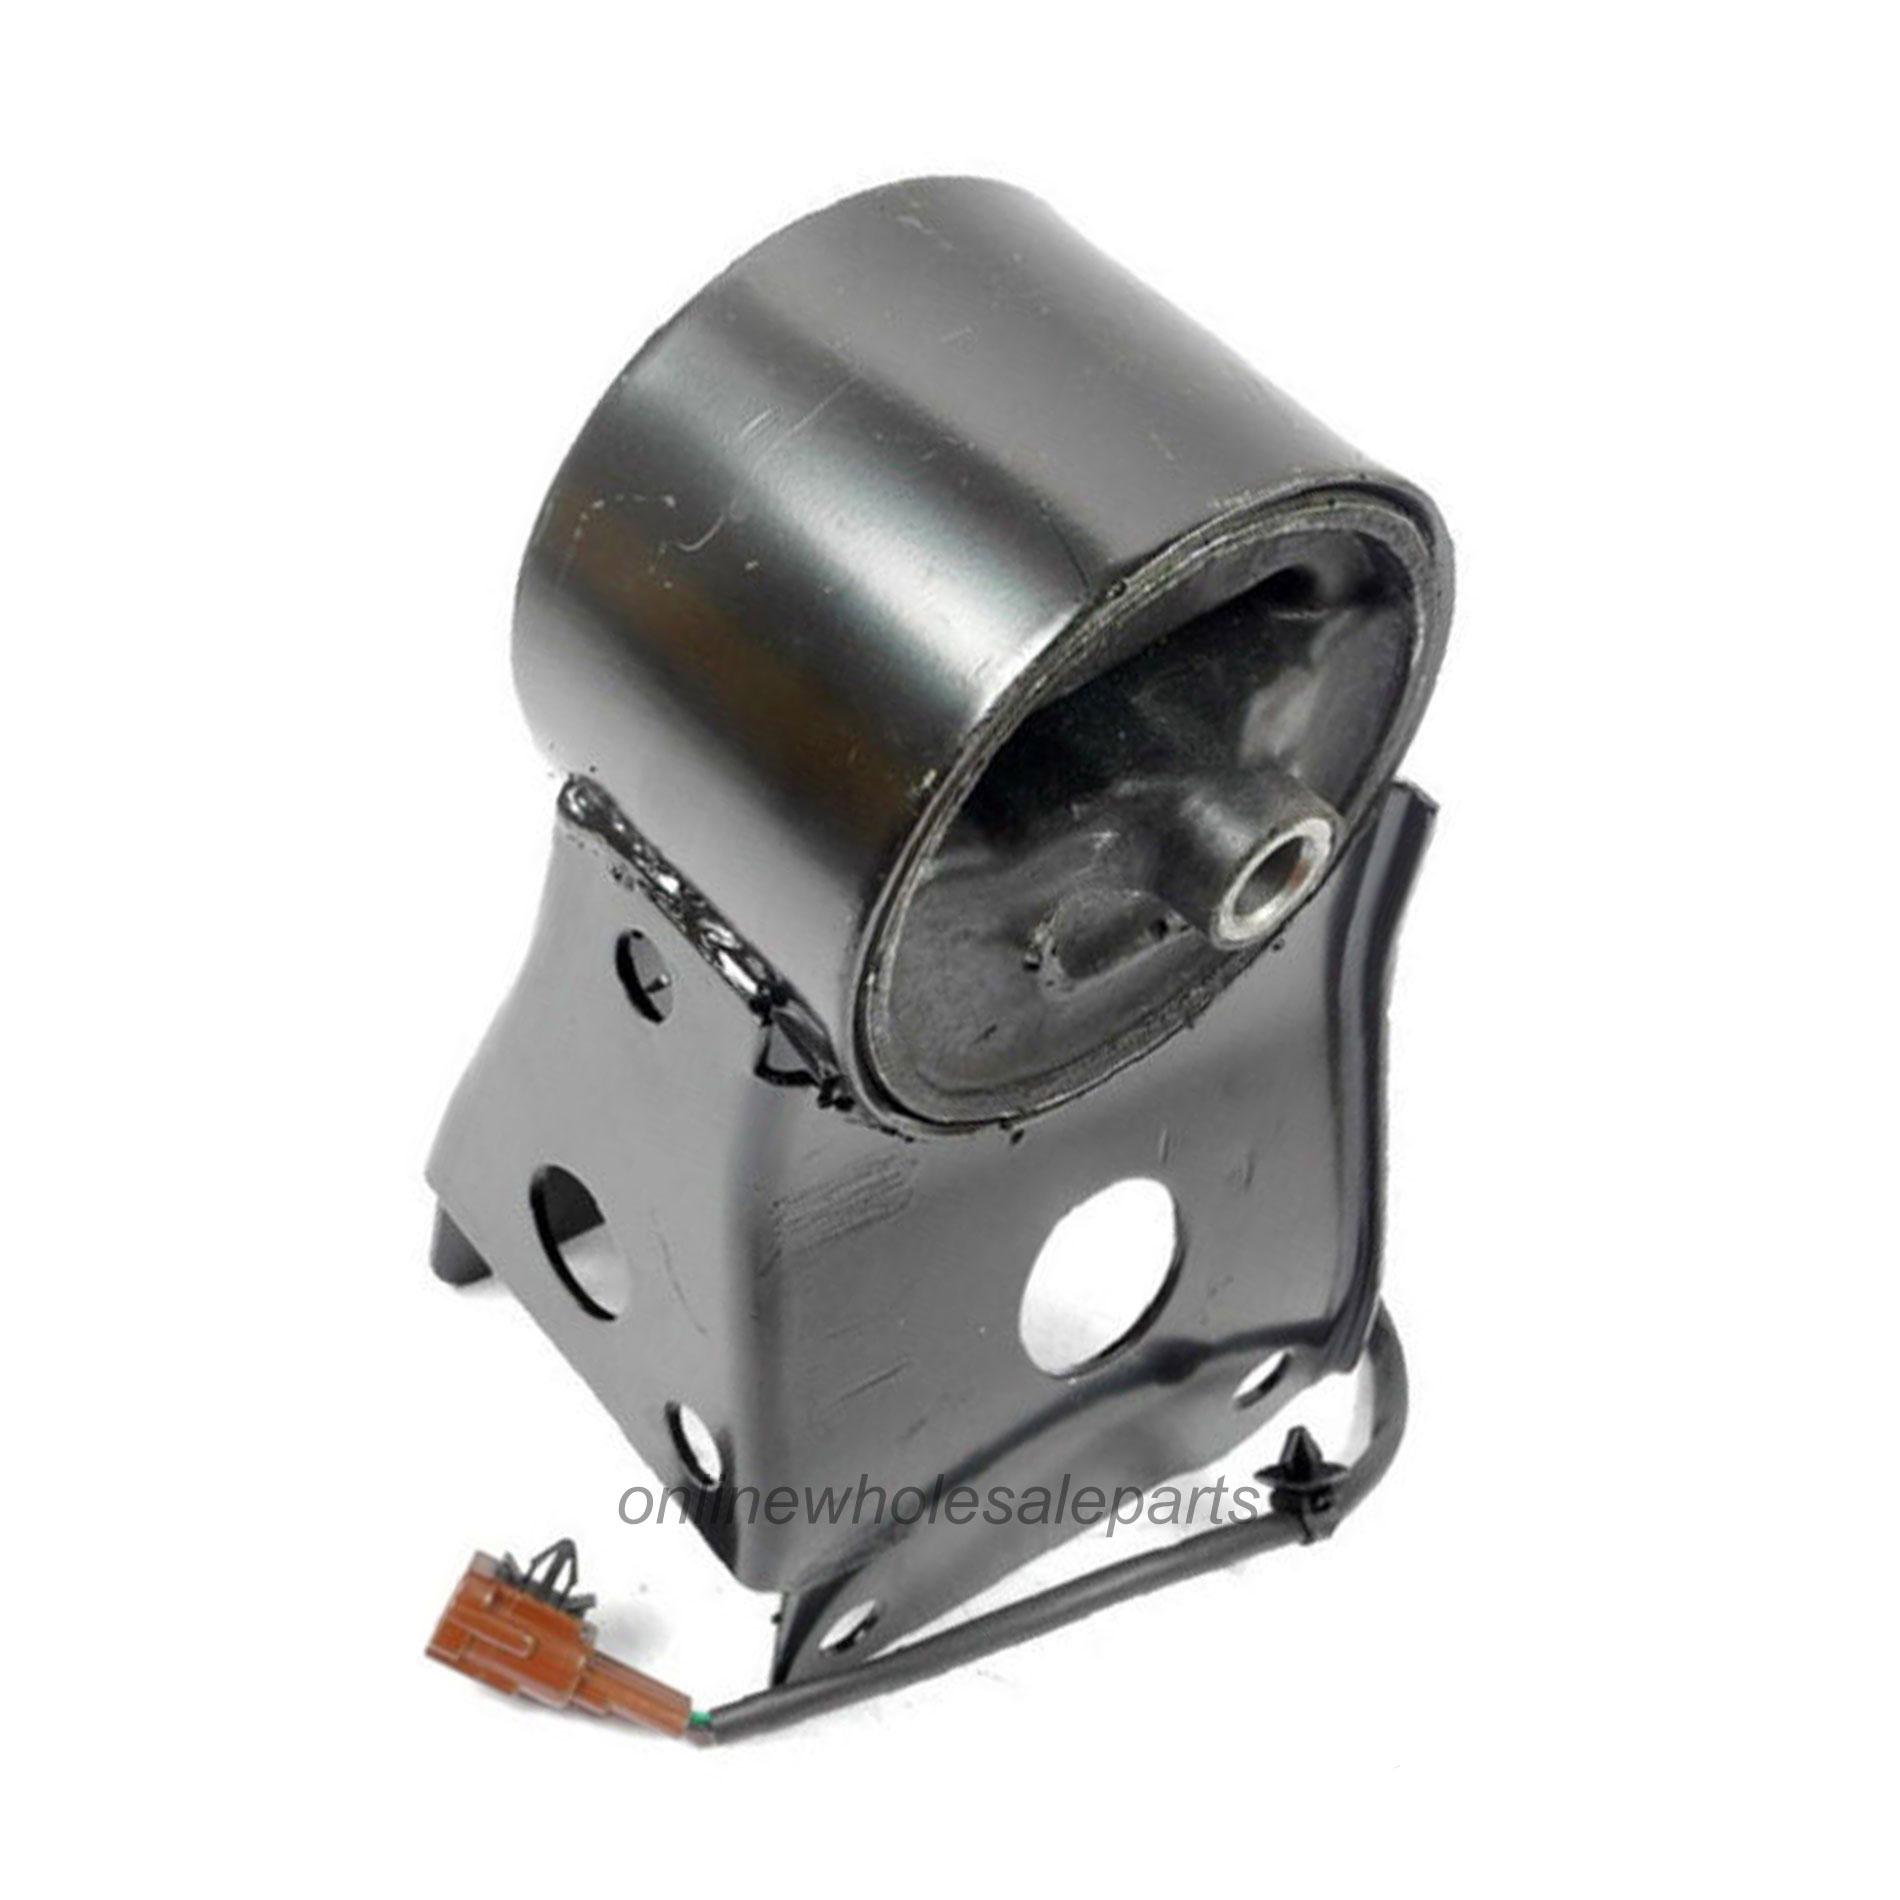 For Infiniti I30 I35 Nissan Maxima Front Engine Motor Mount W//Solenoid A7306EL